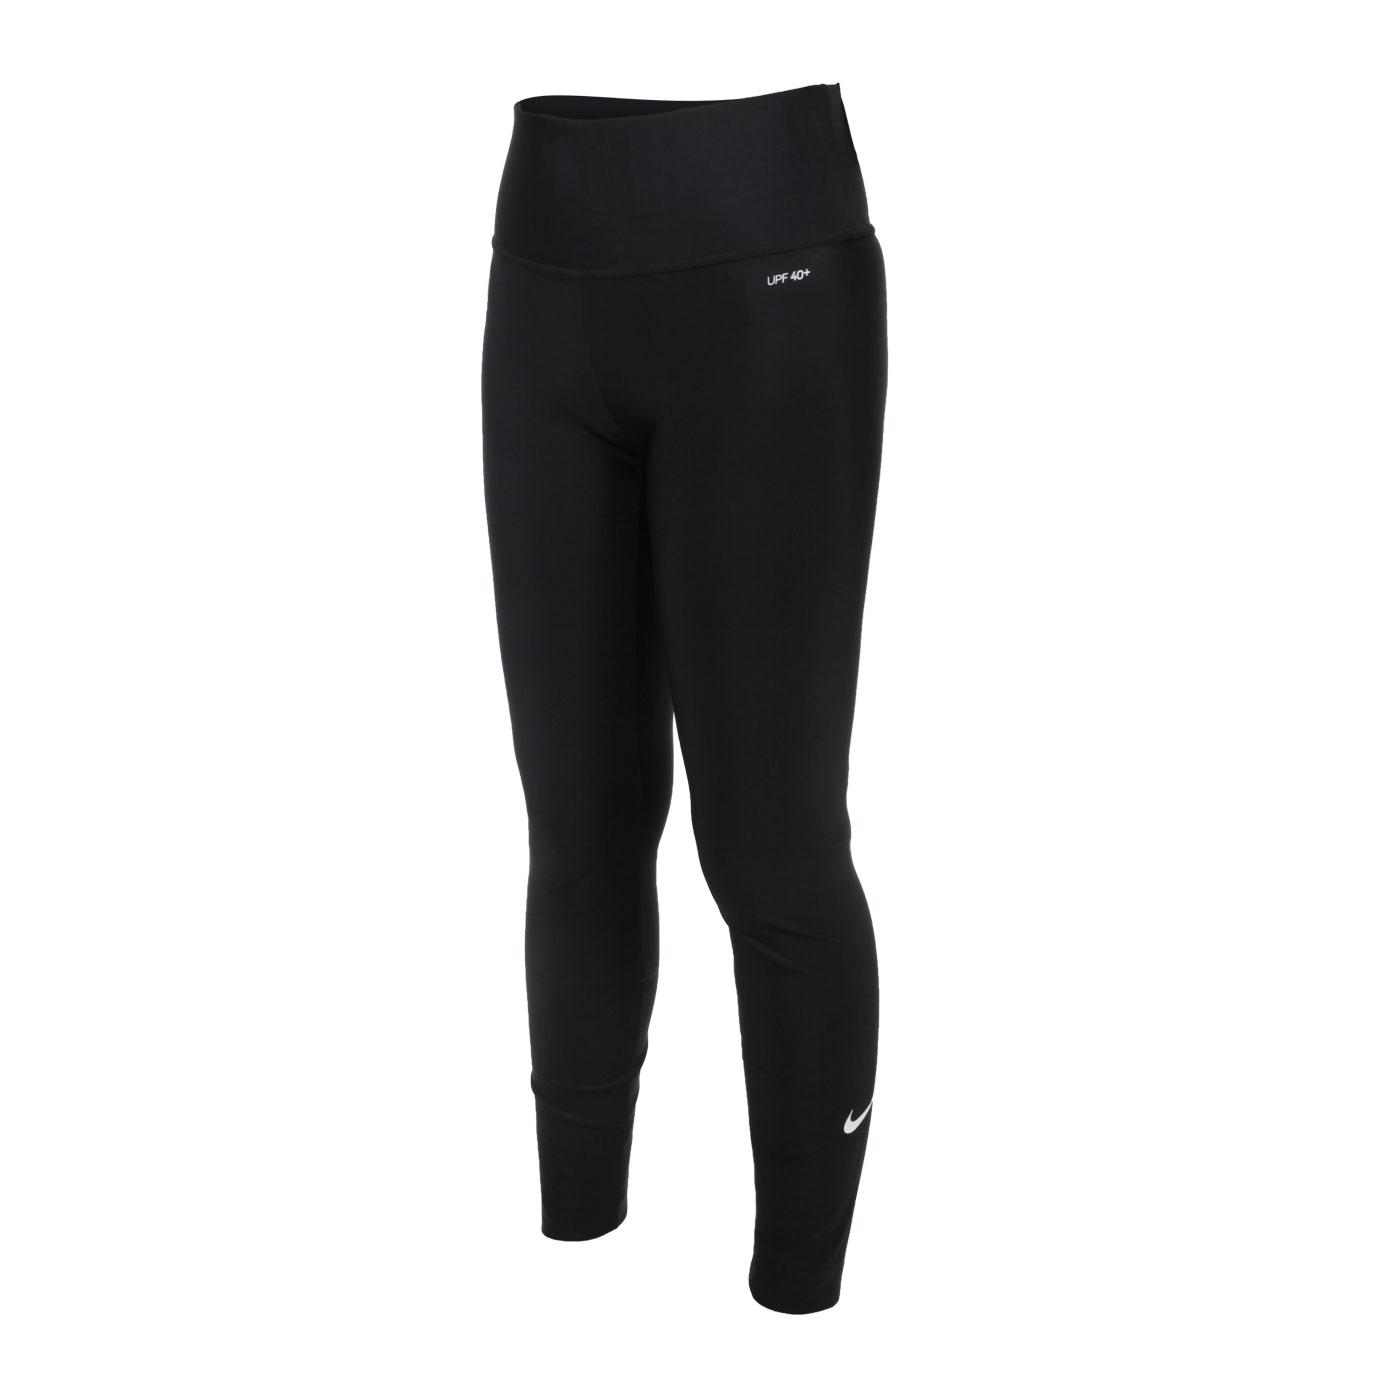 NIKE SWIM 女款成人長版泳褲 NESSA442-001 - 黑白